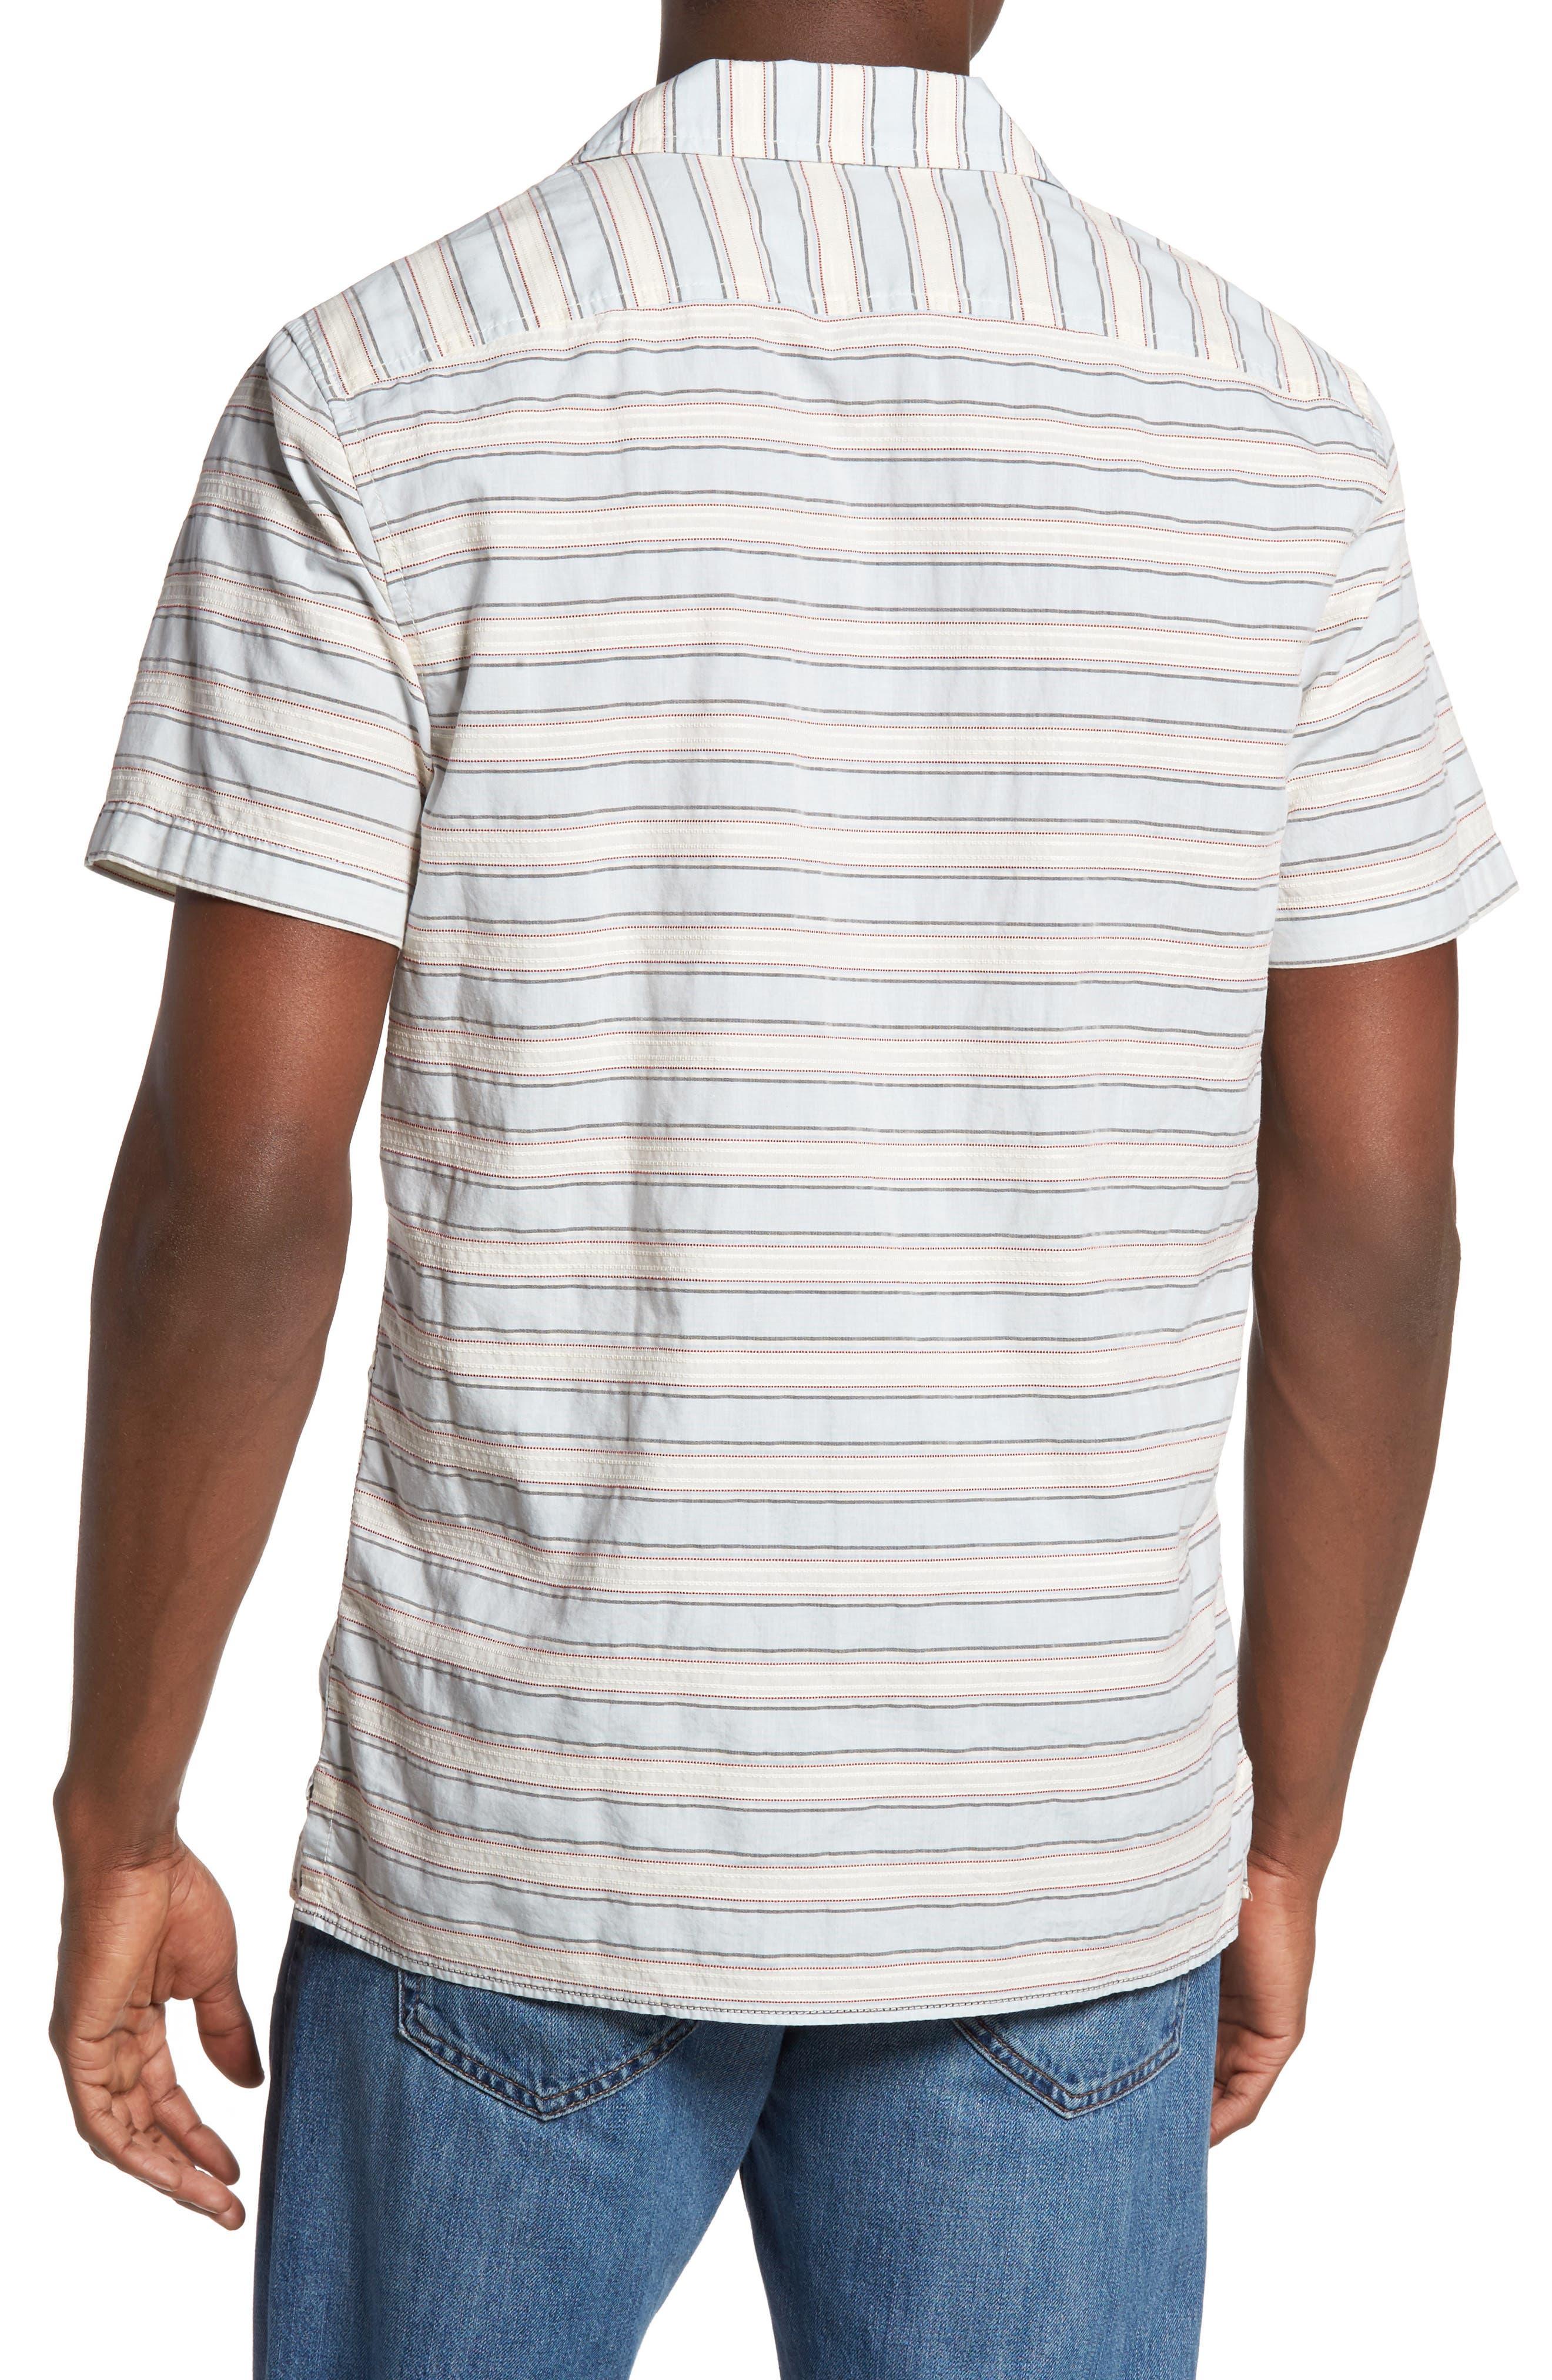 Alternate Image 2  - 1901 Jacquard Stripe Camp Shirt